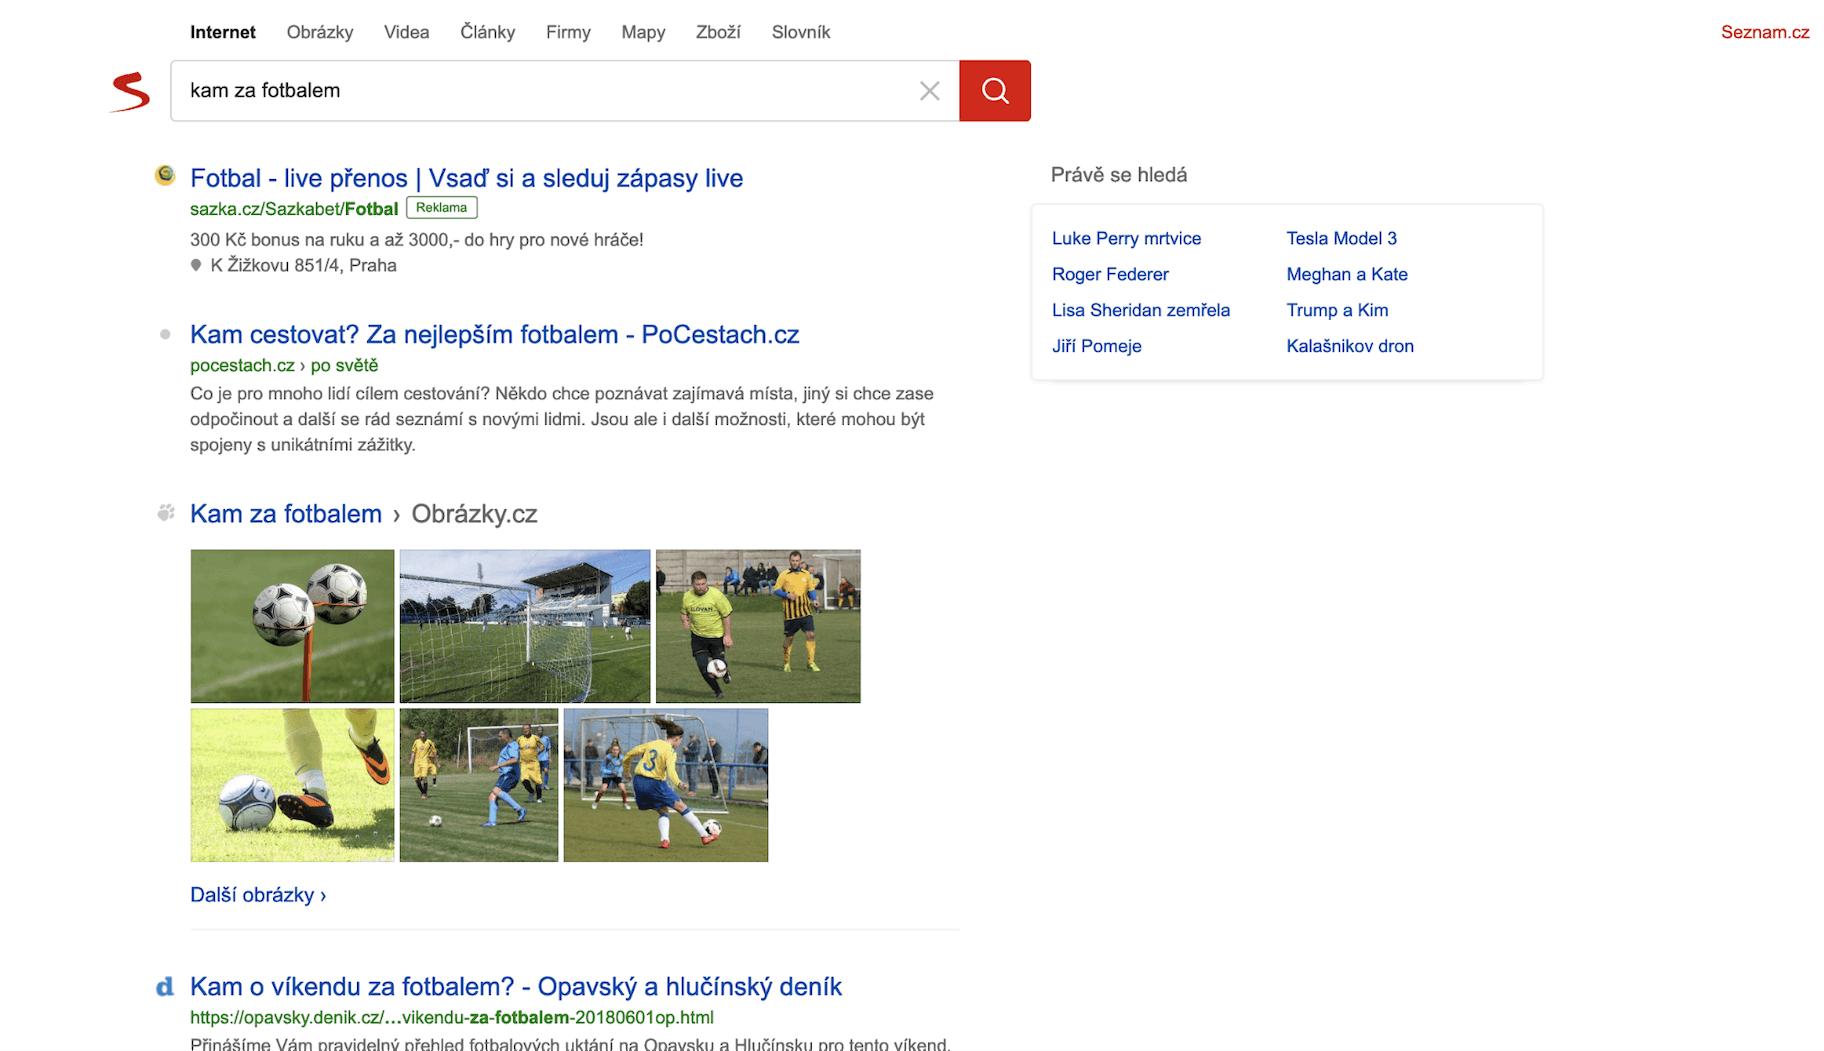 Seznam Search Engine